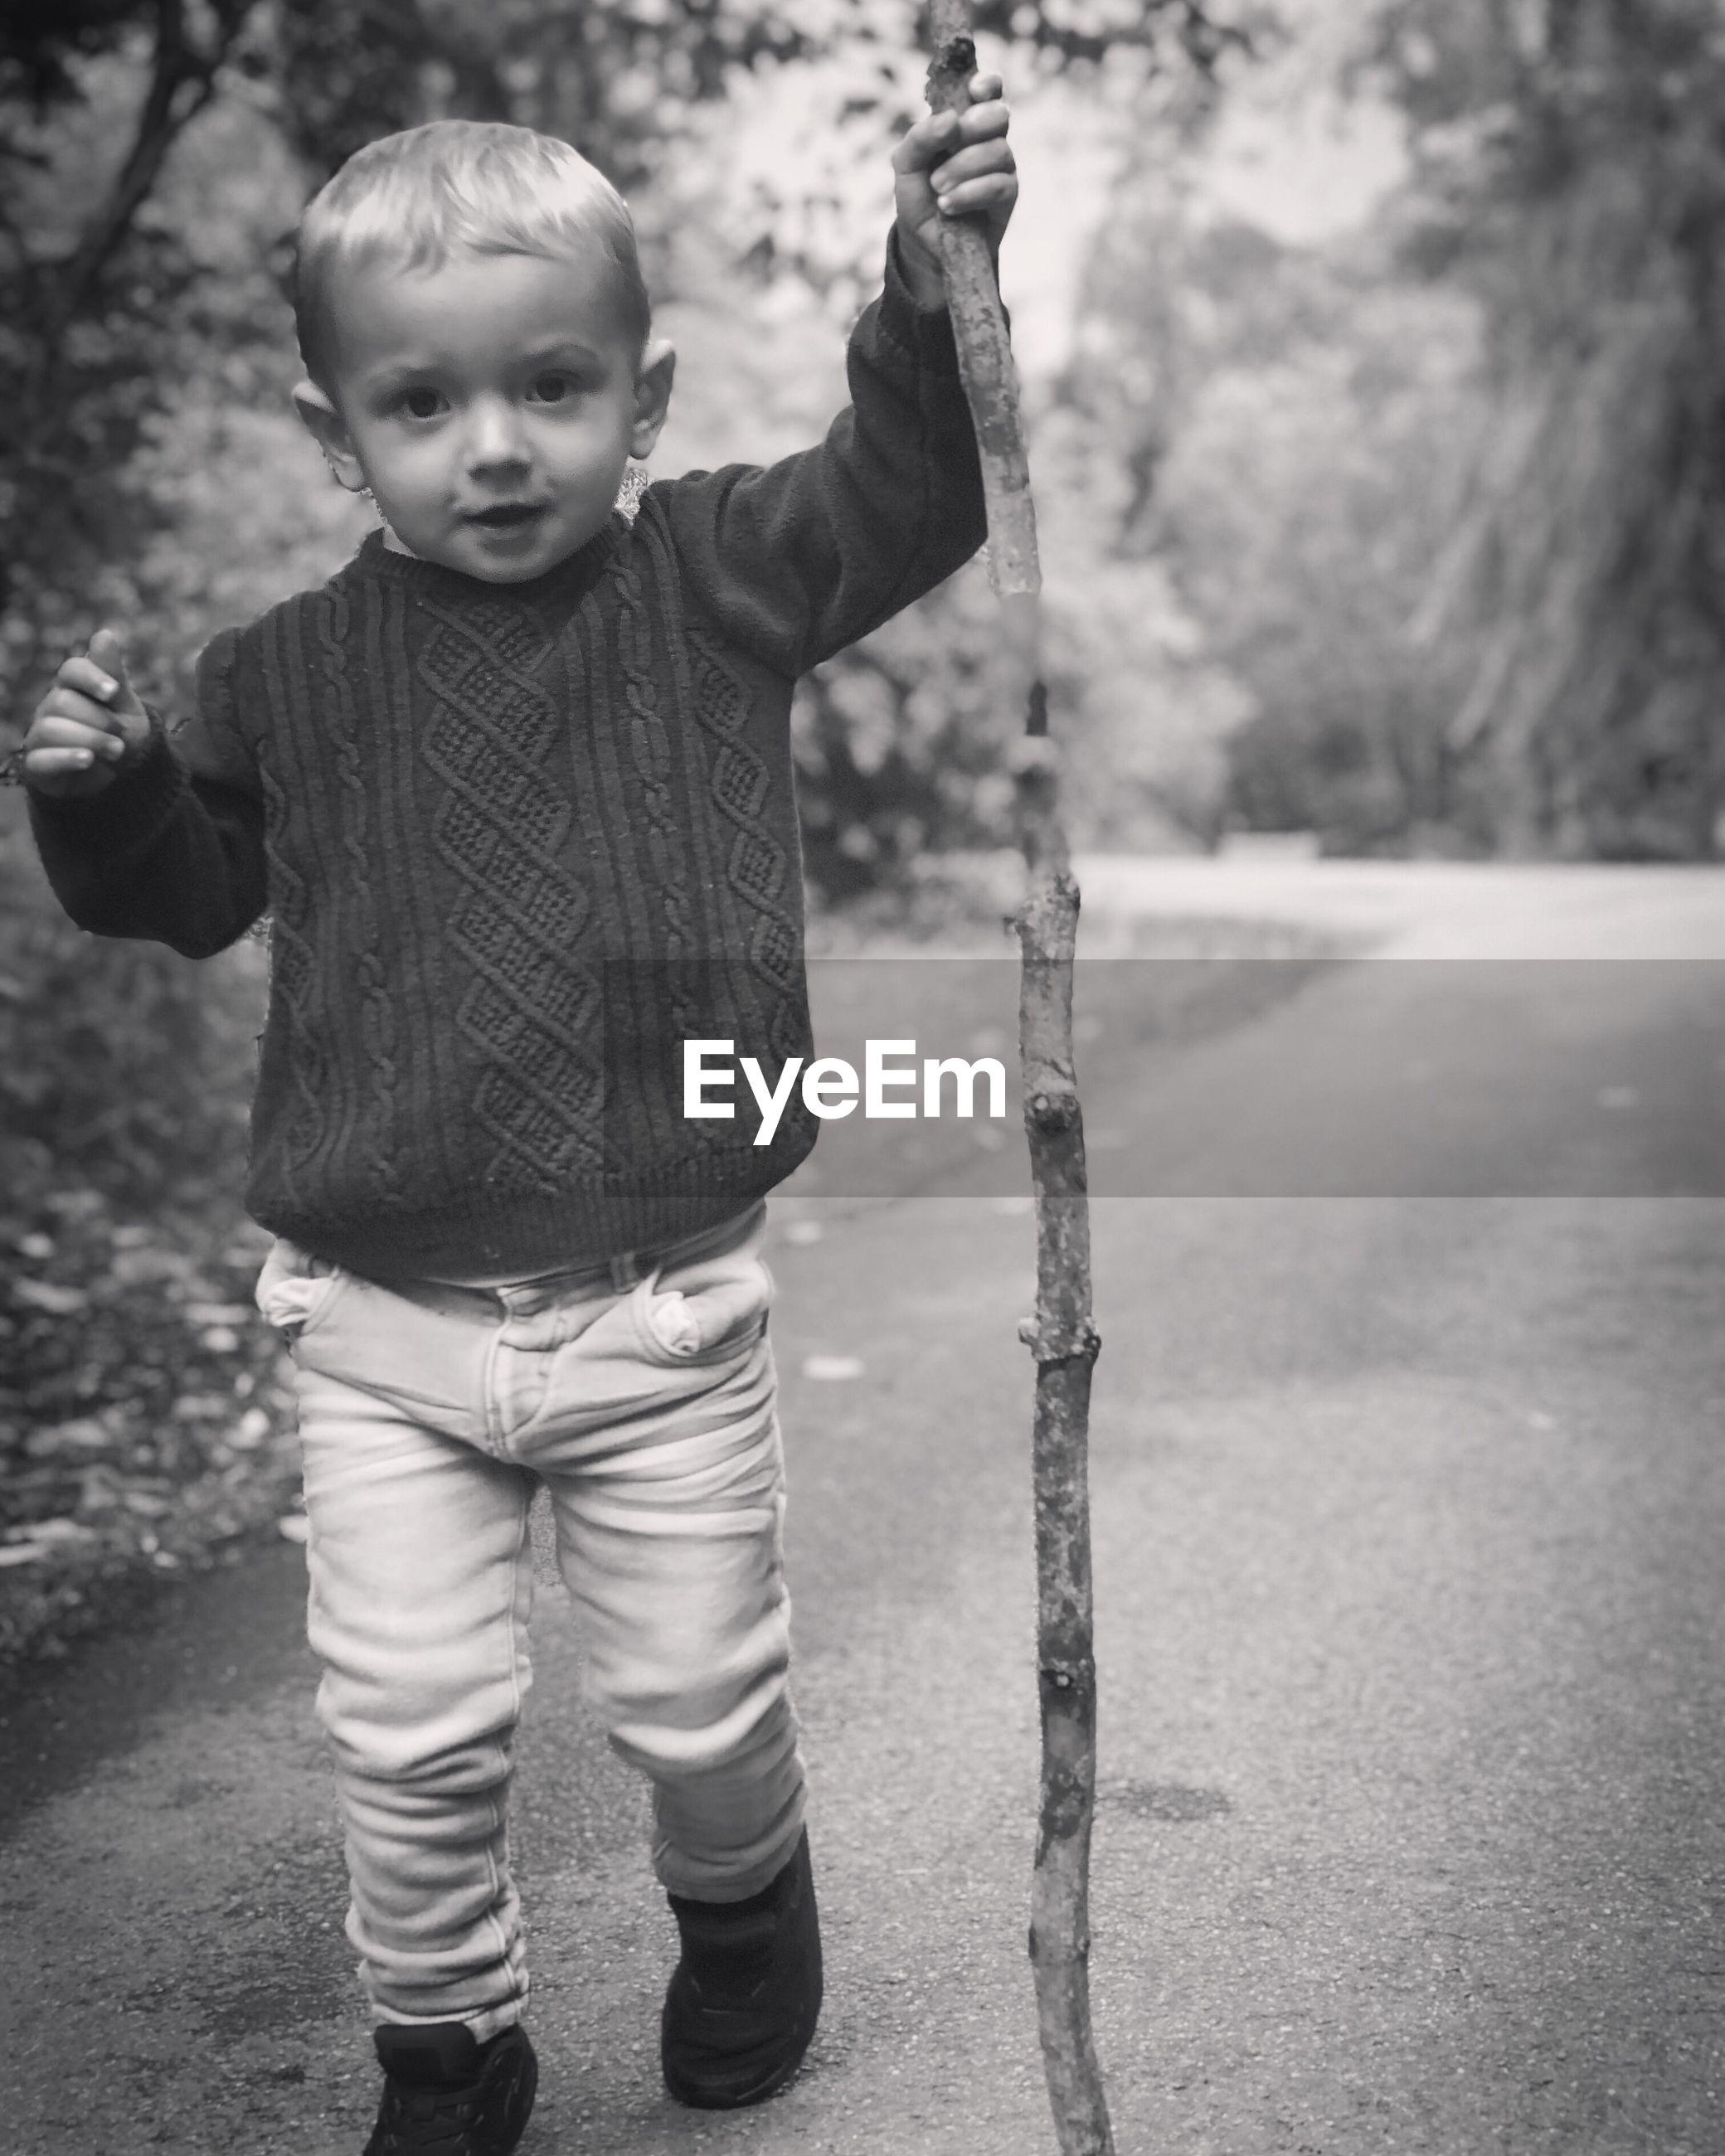 Portrait of cute boy with stick walking on road